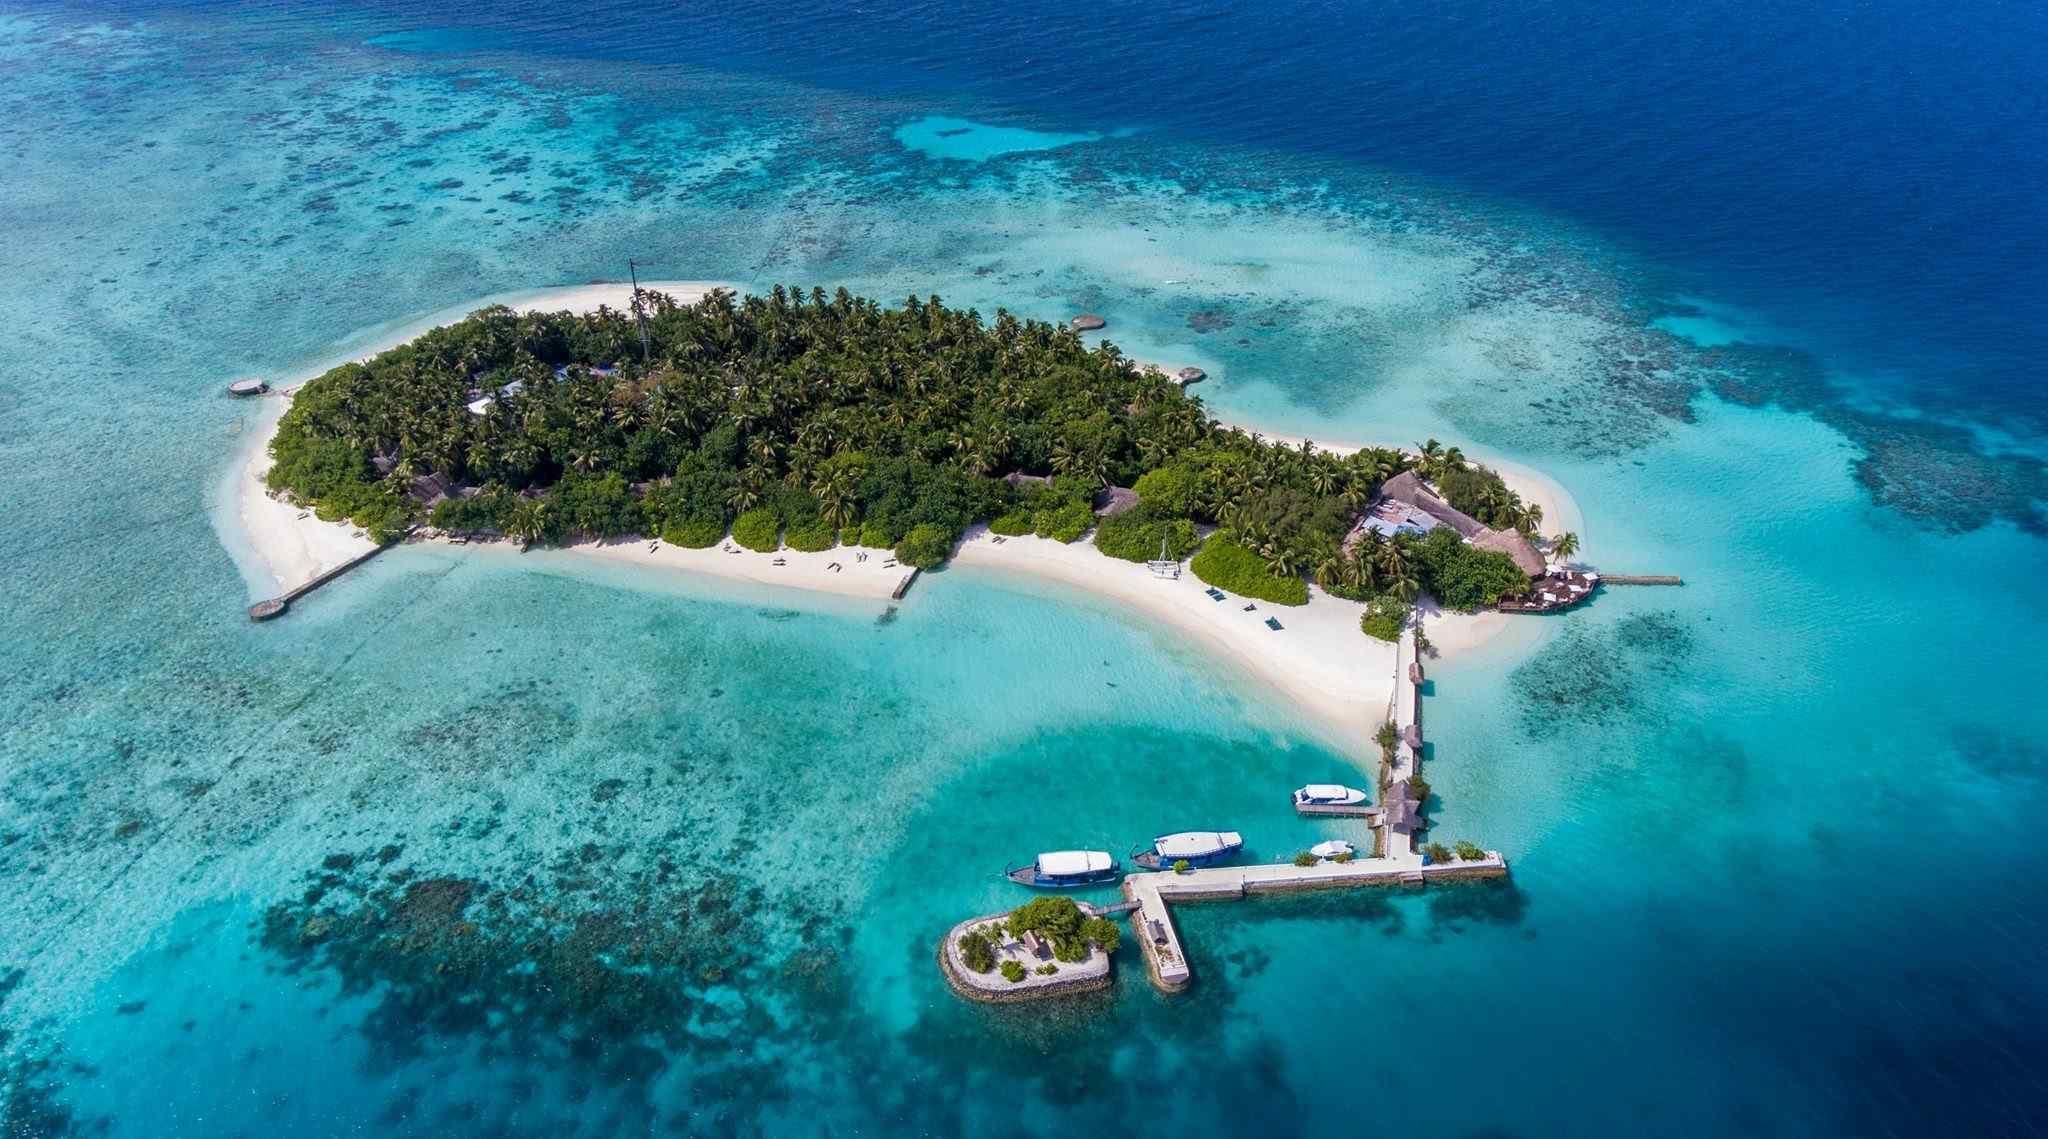 Maldive Old Style: Makunudu Island